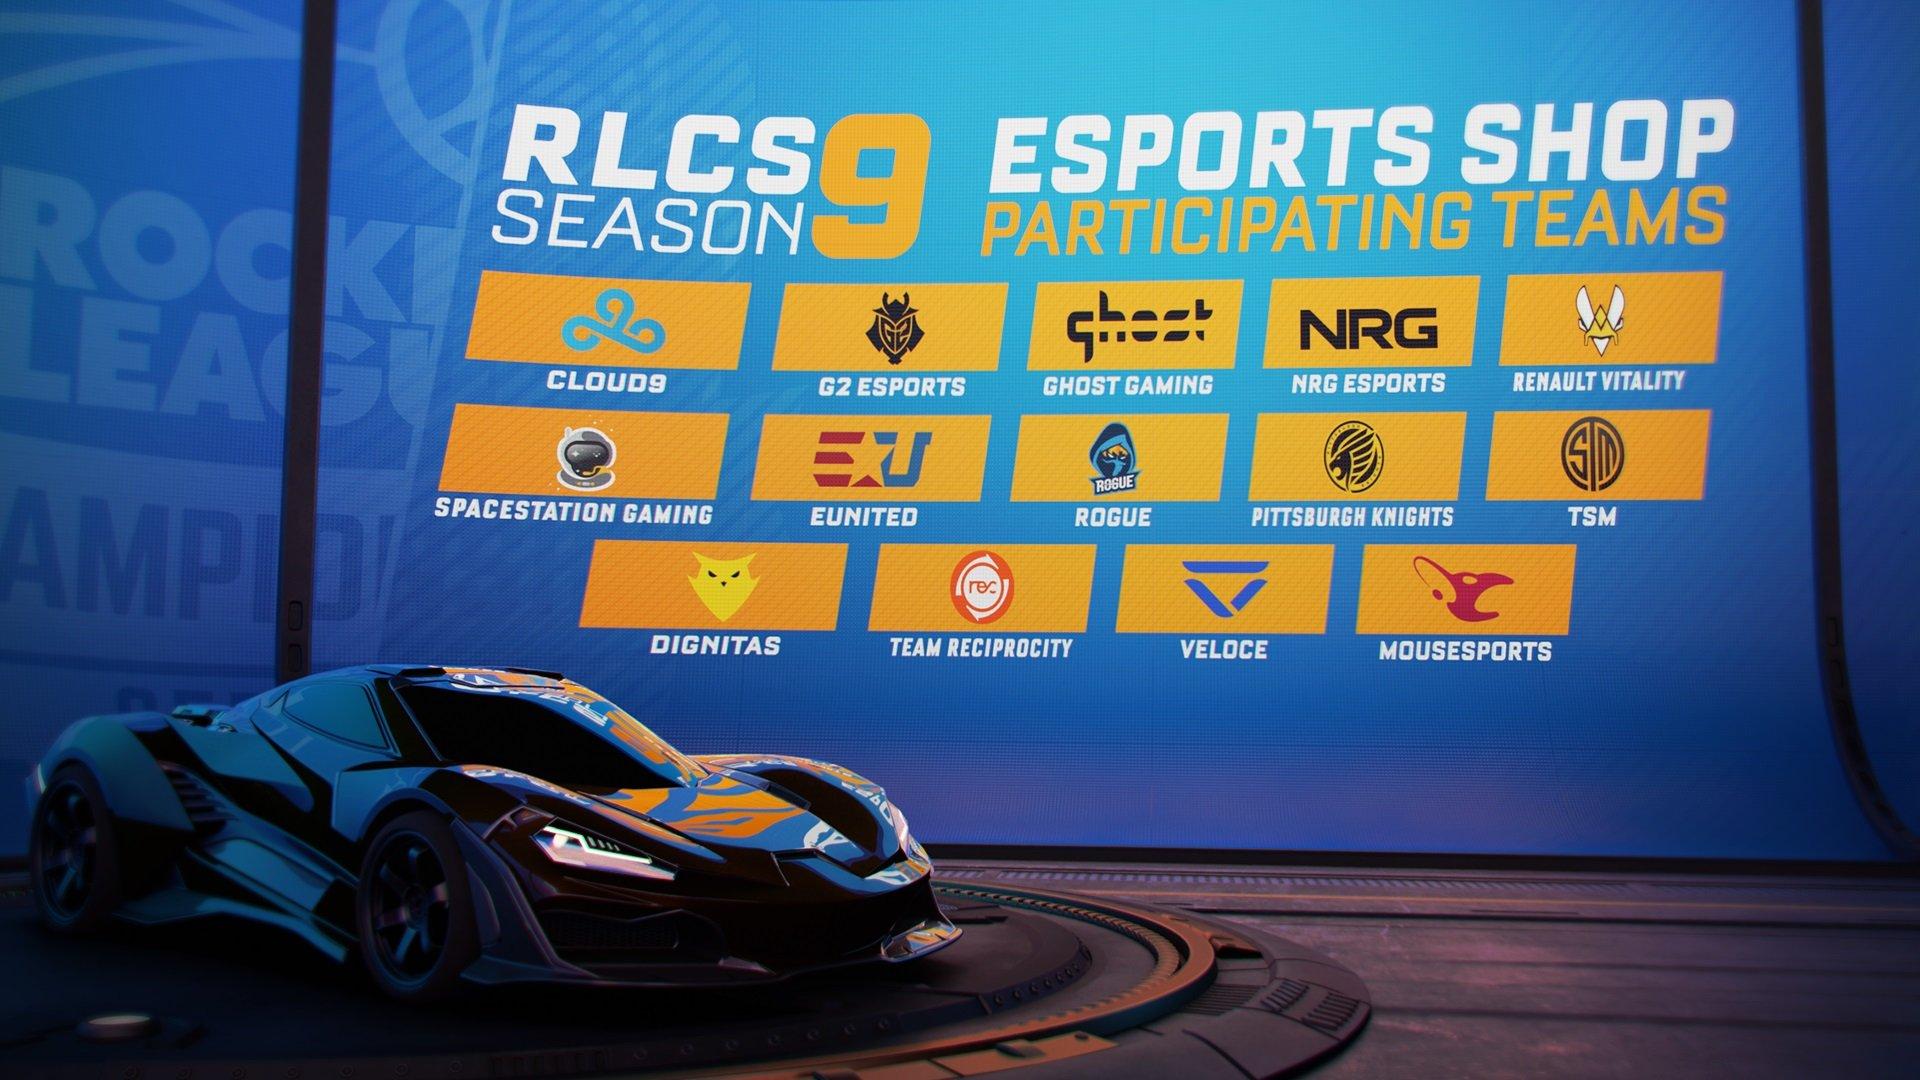 Rocket League Esports Shop